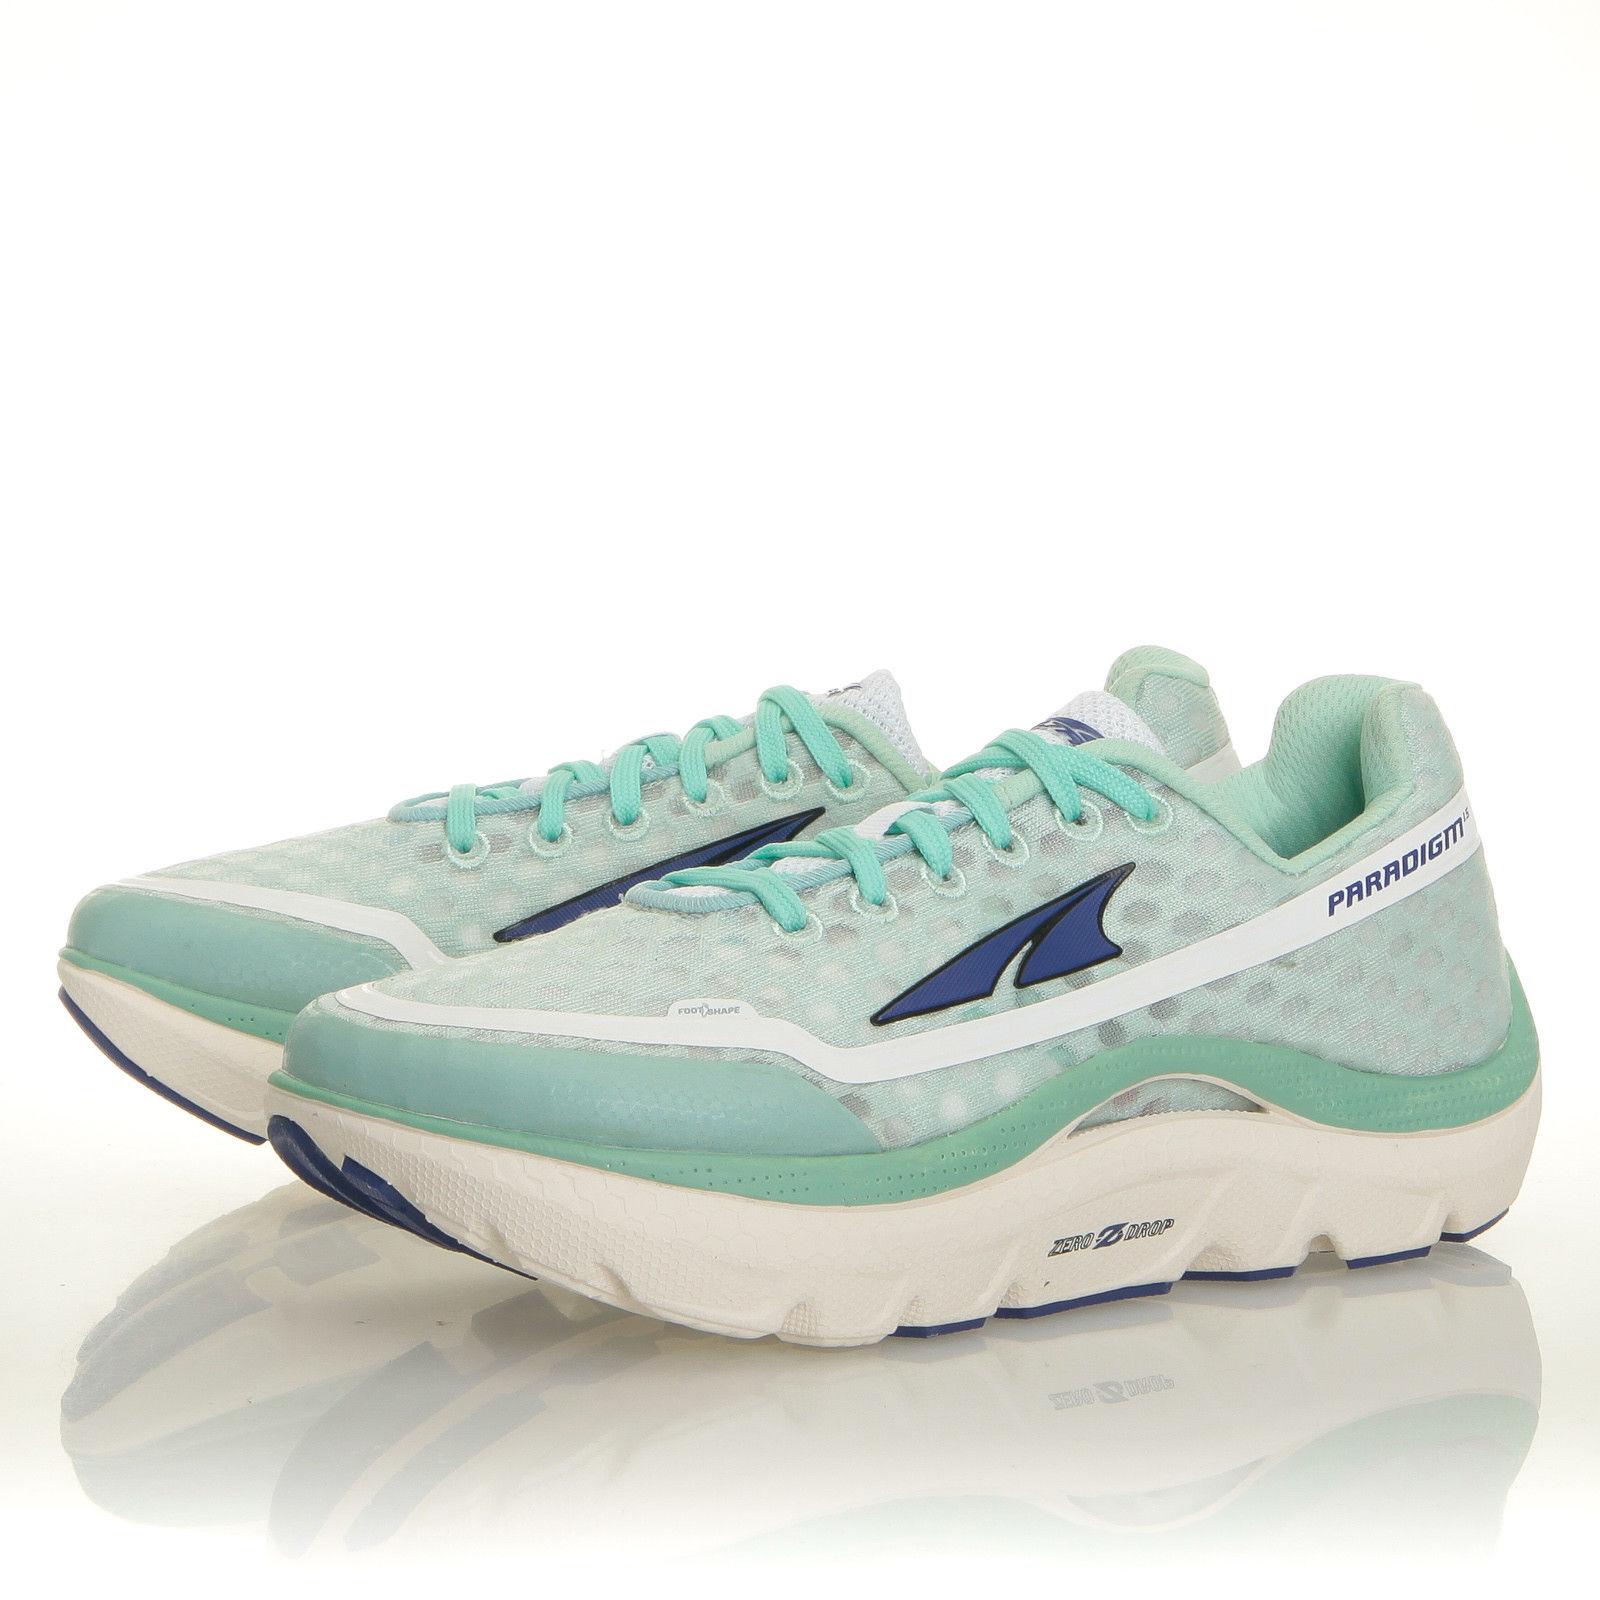 Altra Womens Paradigm 15 Zero Drop Running Shoes Trainers Sneaker